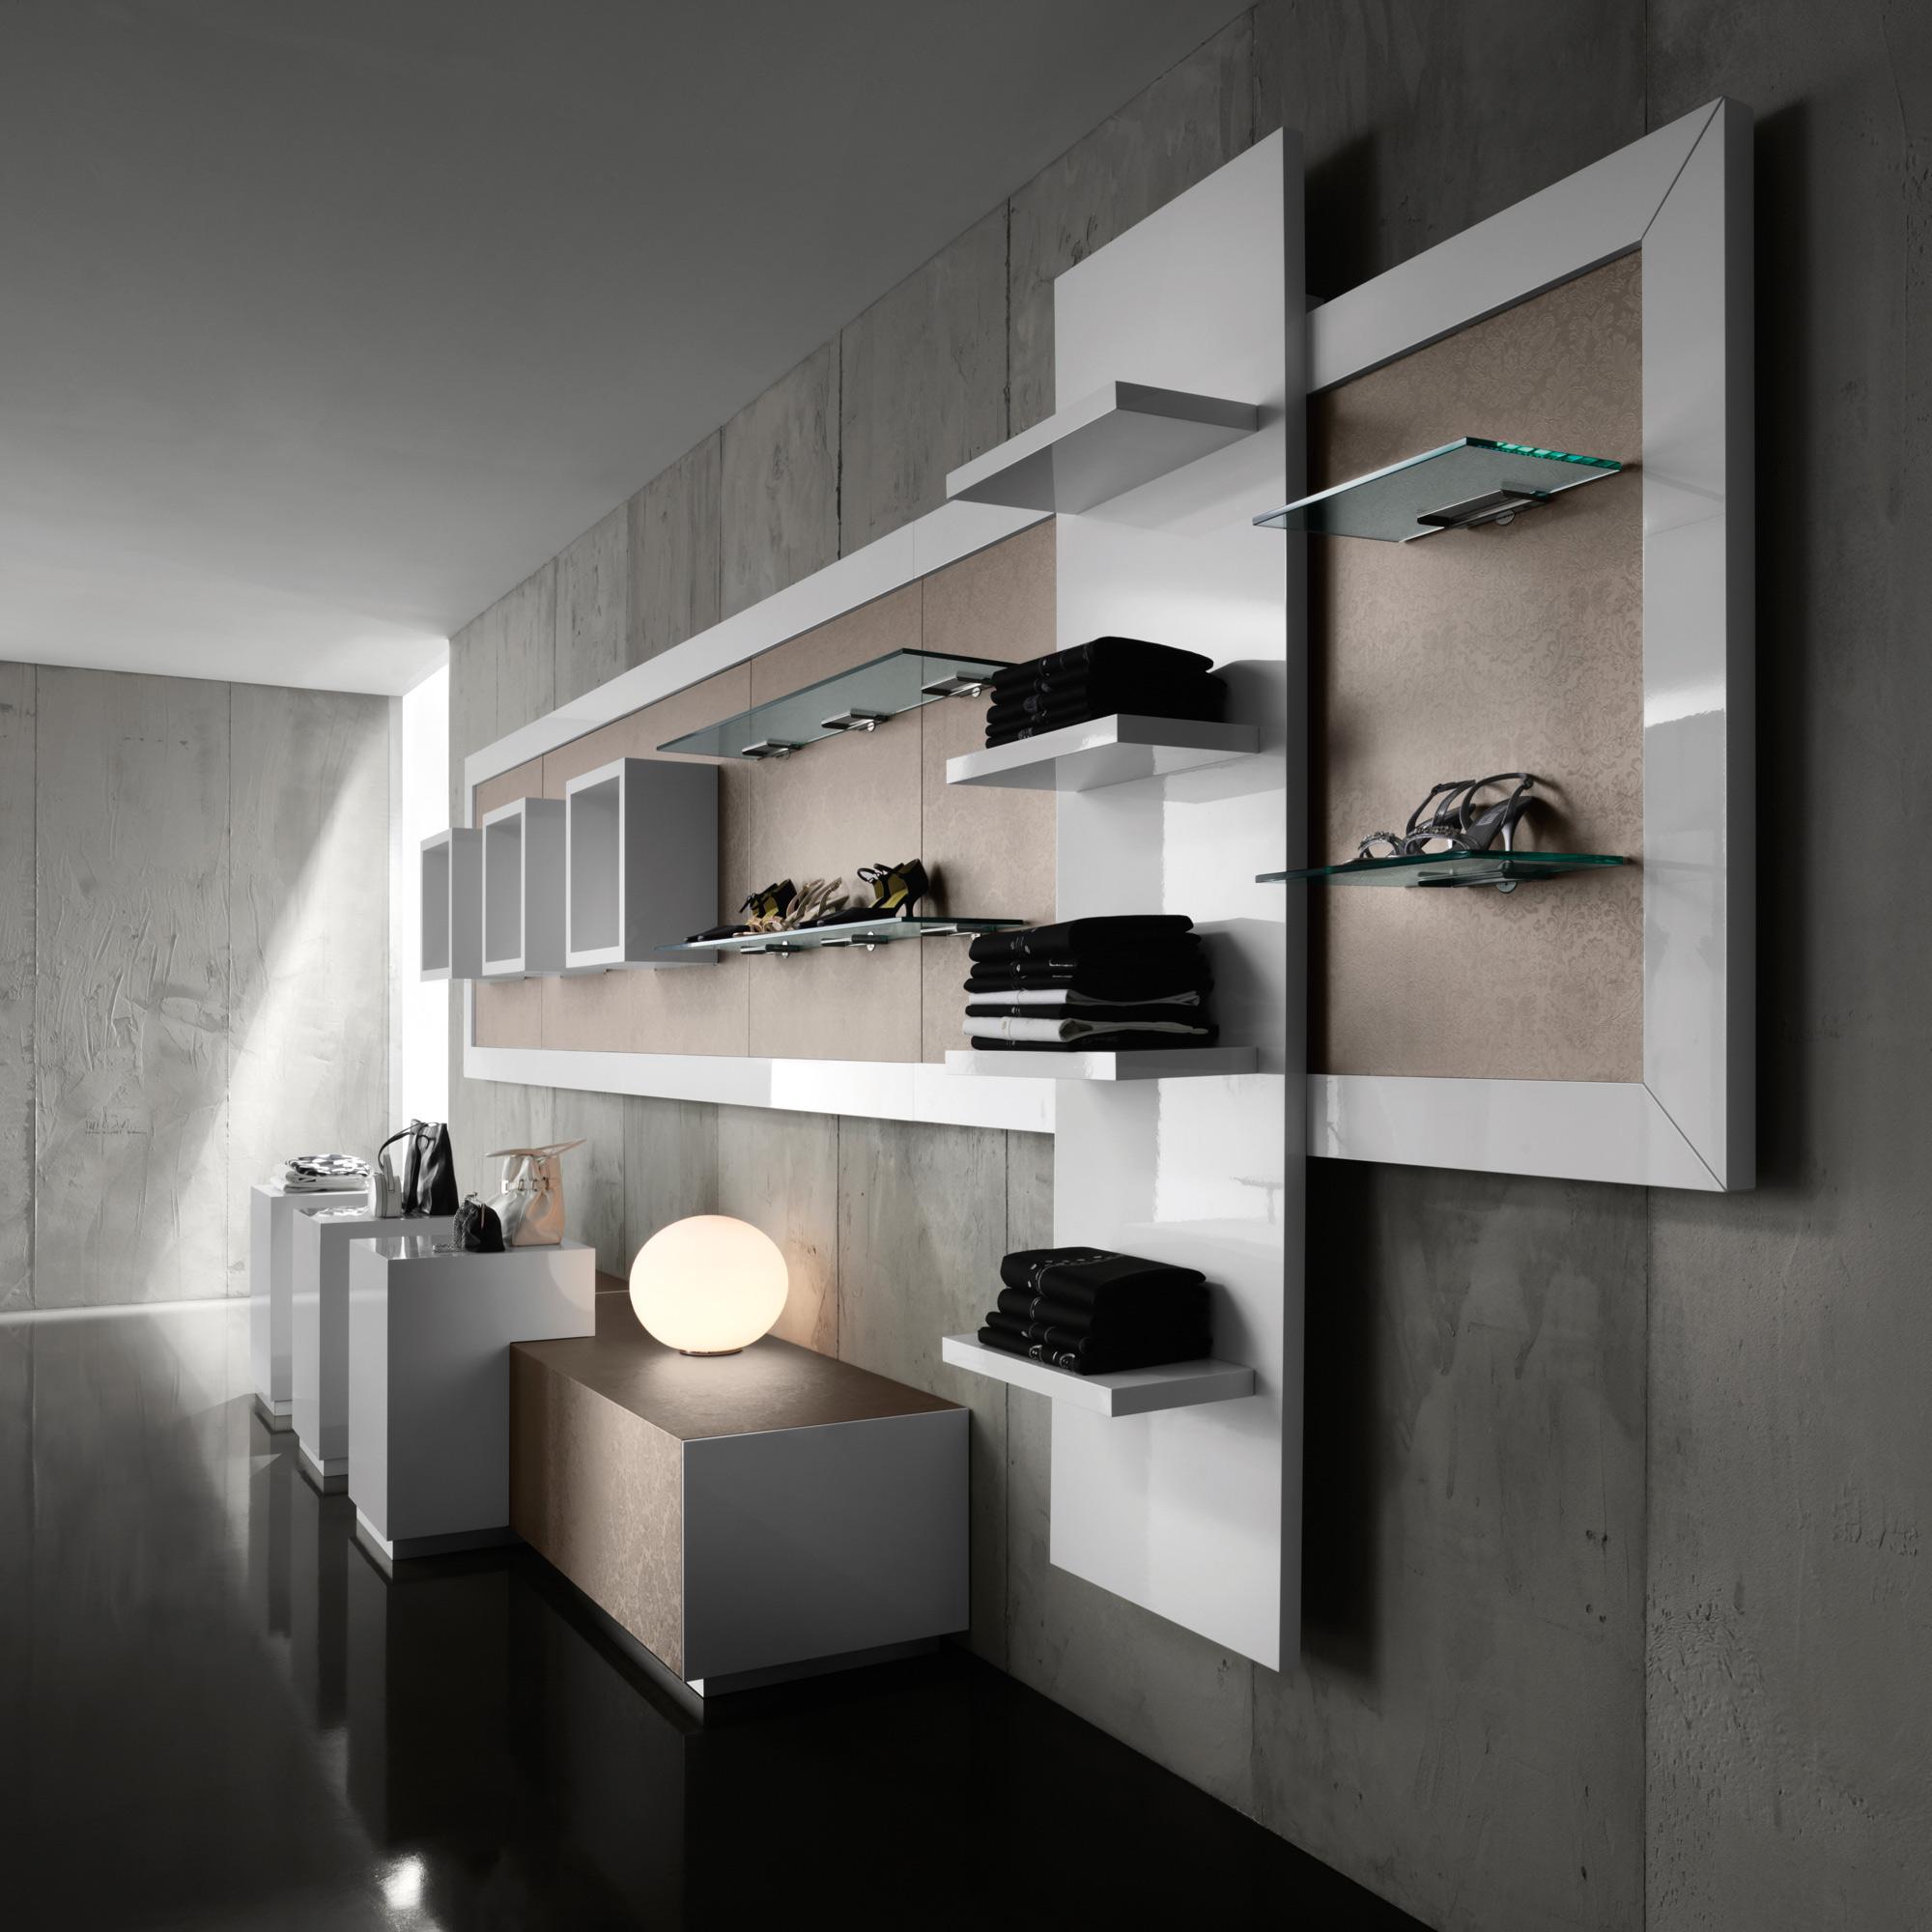 Arredamento per negozi di abbigliamento toscana belardi for Arredamento di design tedesco